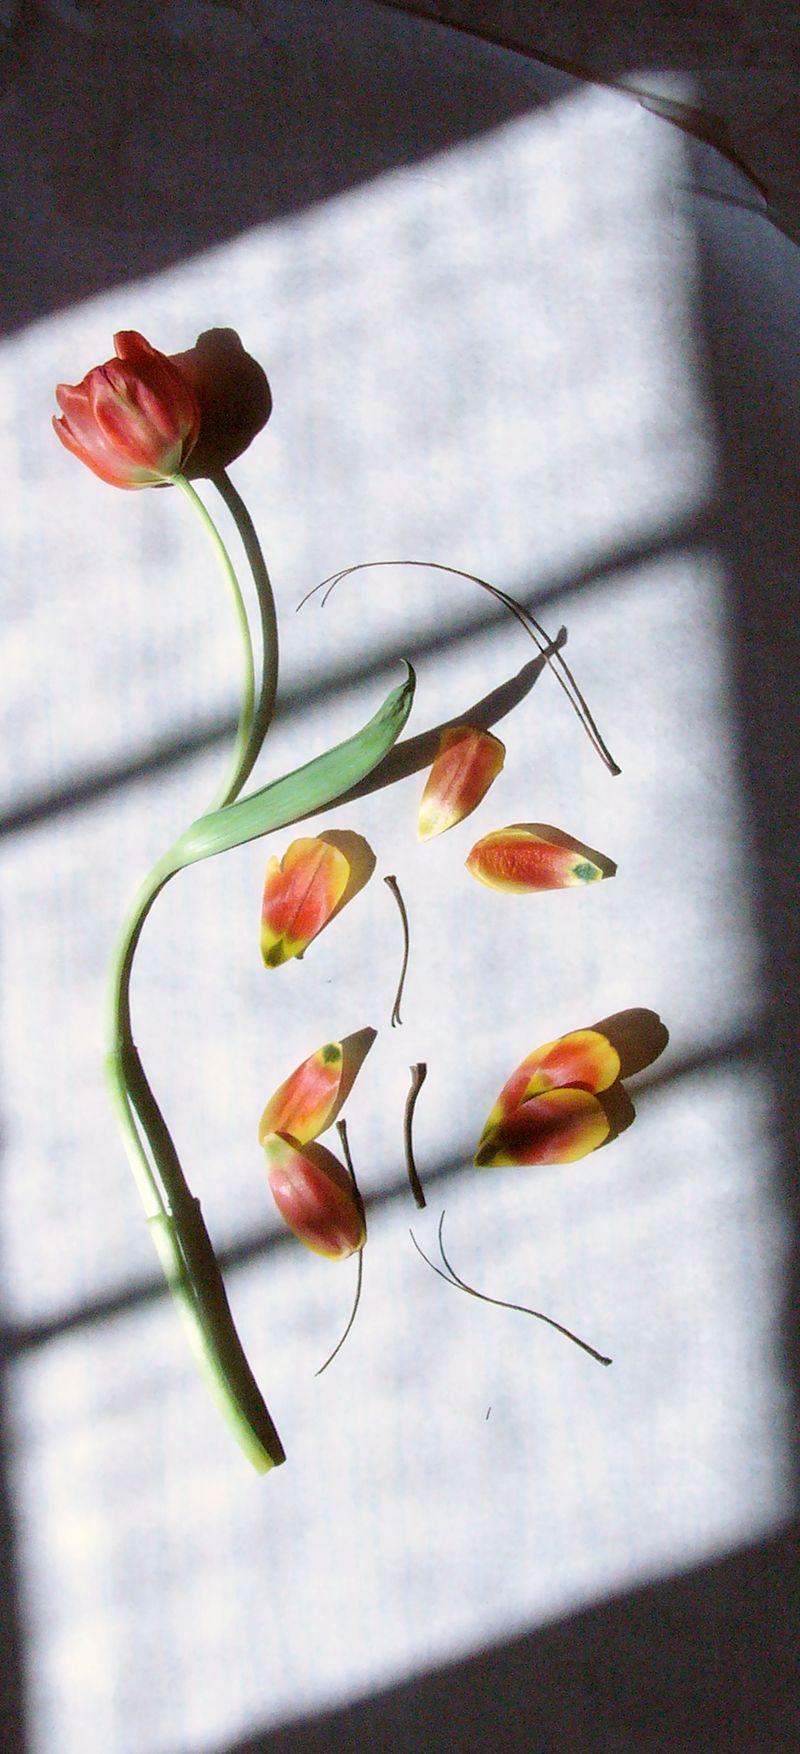 Tulipsredux copy